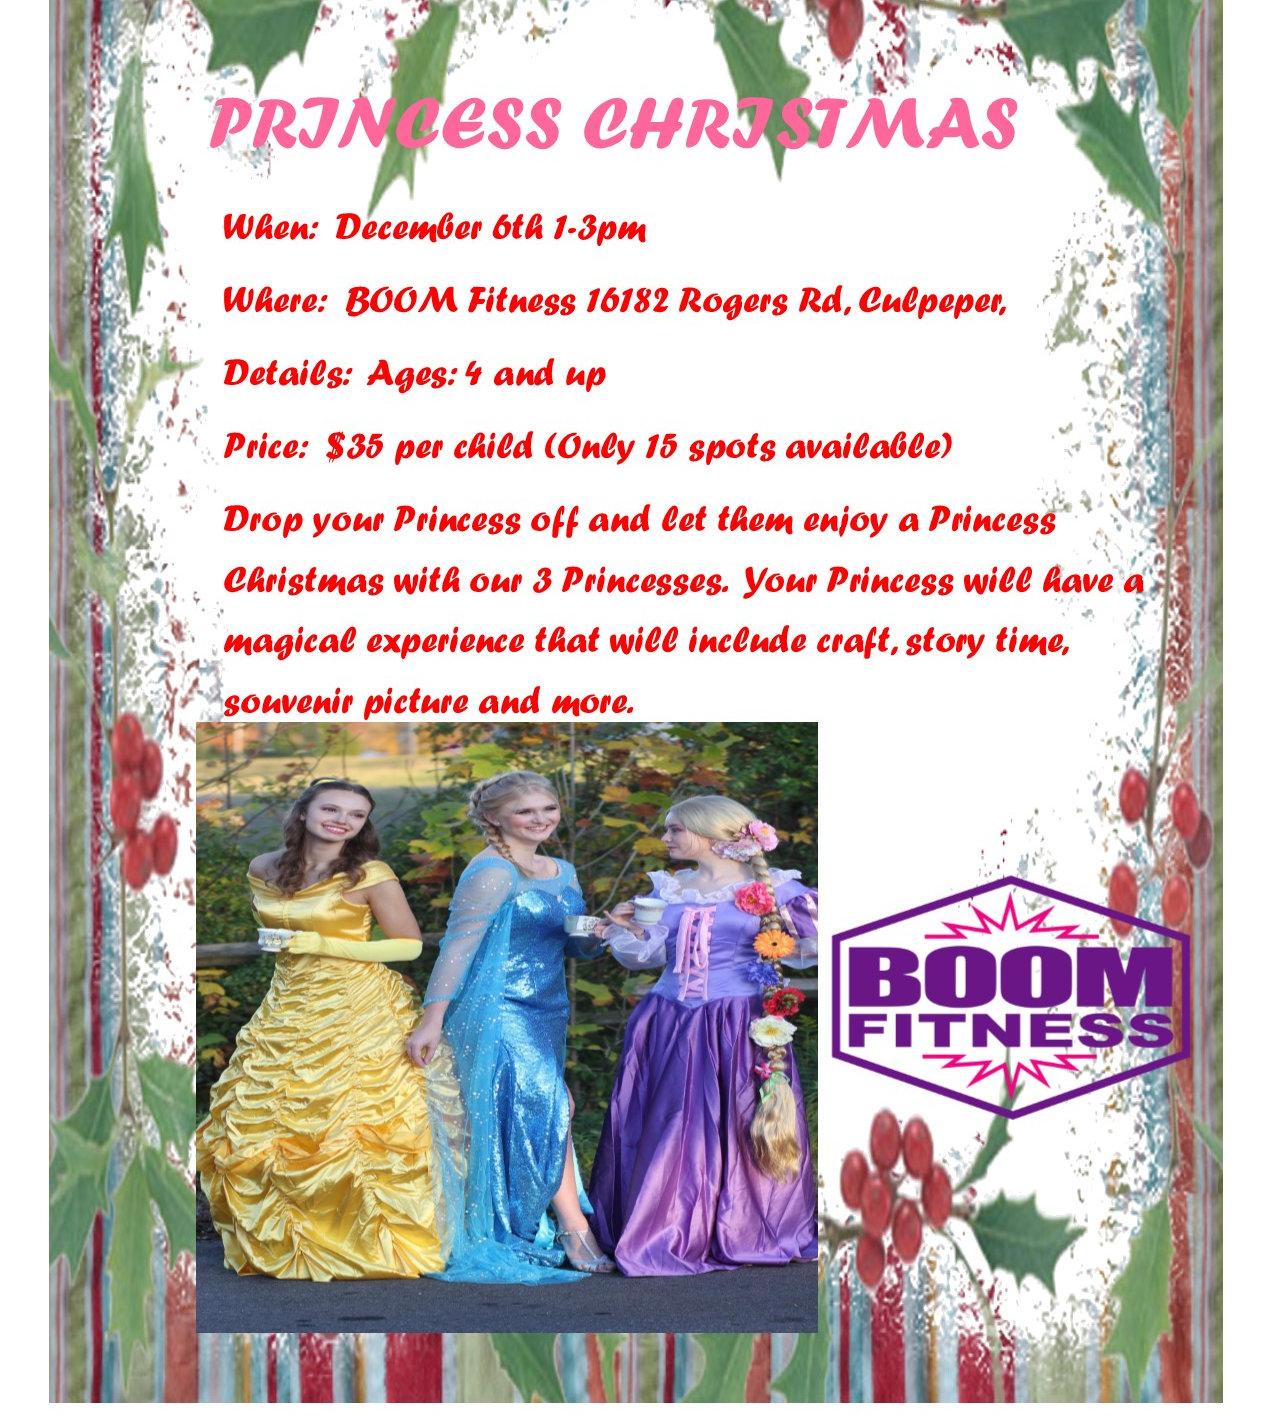 Princess Christmas.jpg